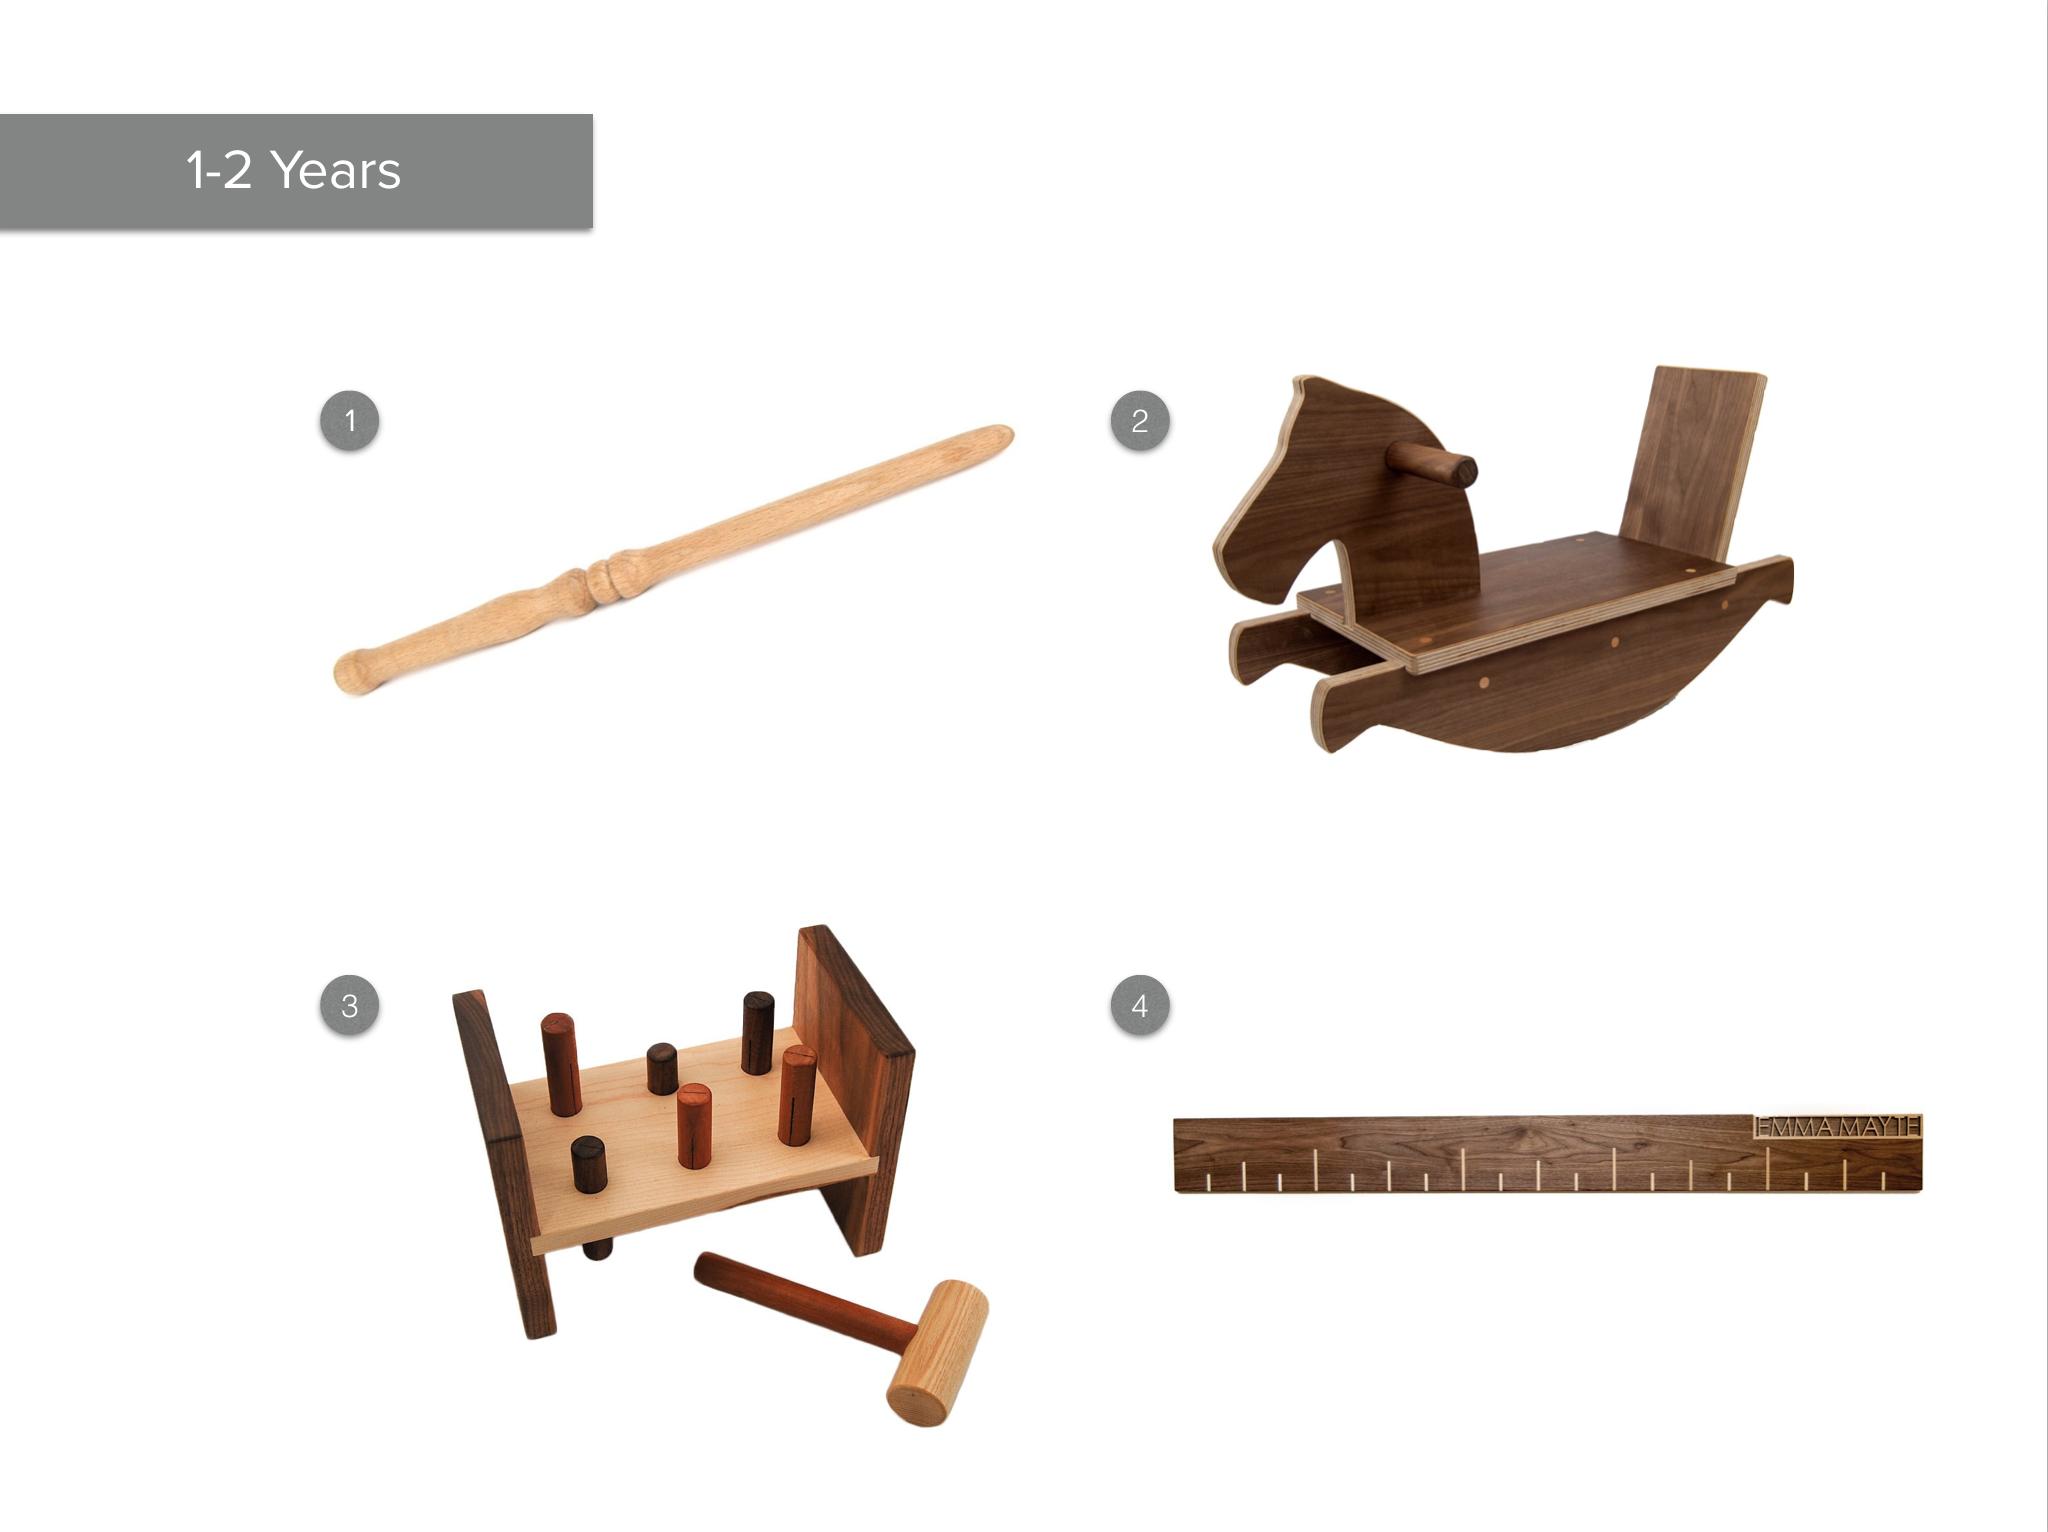 1.  Magic Wand  2.  Walnut Rocking Horse 3.  Hammer Toy 4.  Walnut Growth Chart